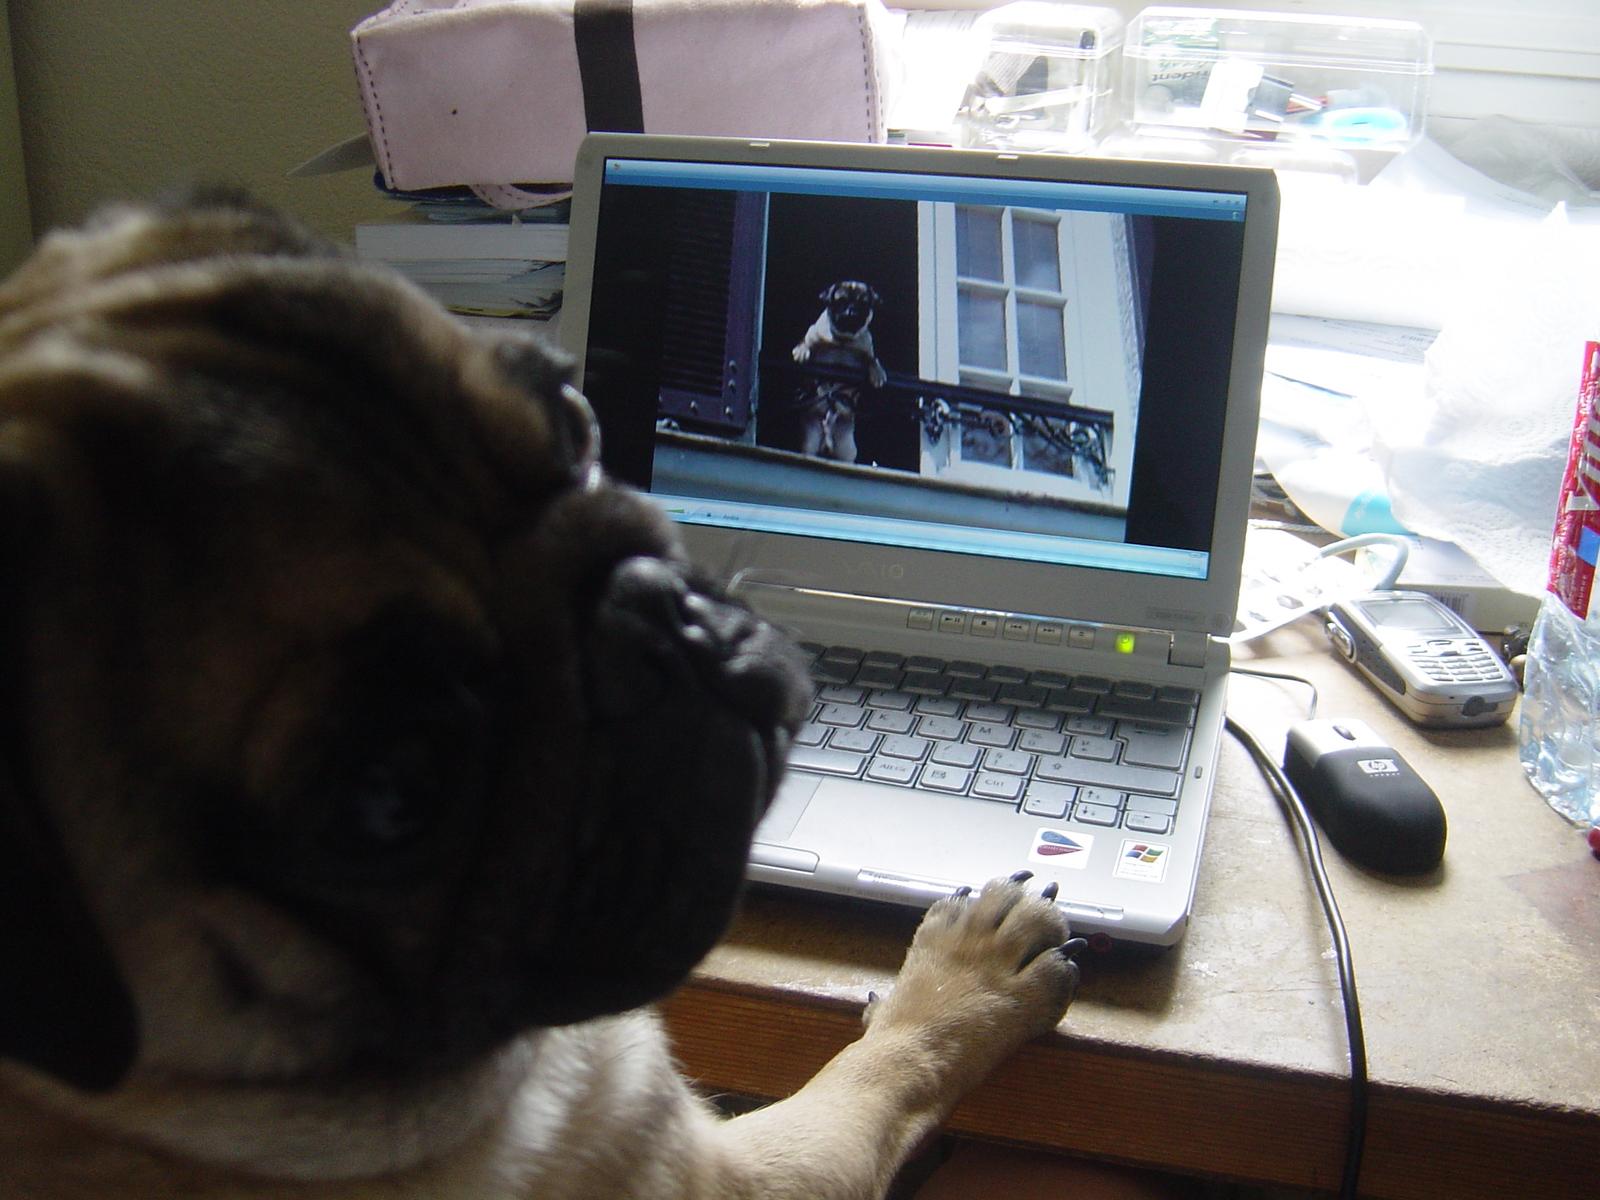 Dog at the Desk